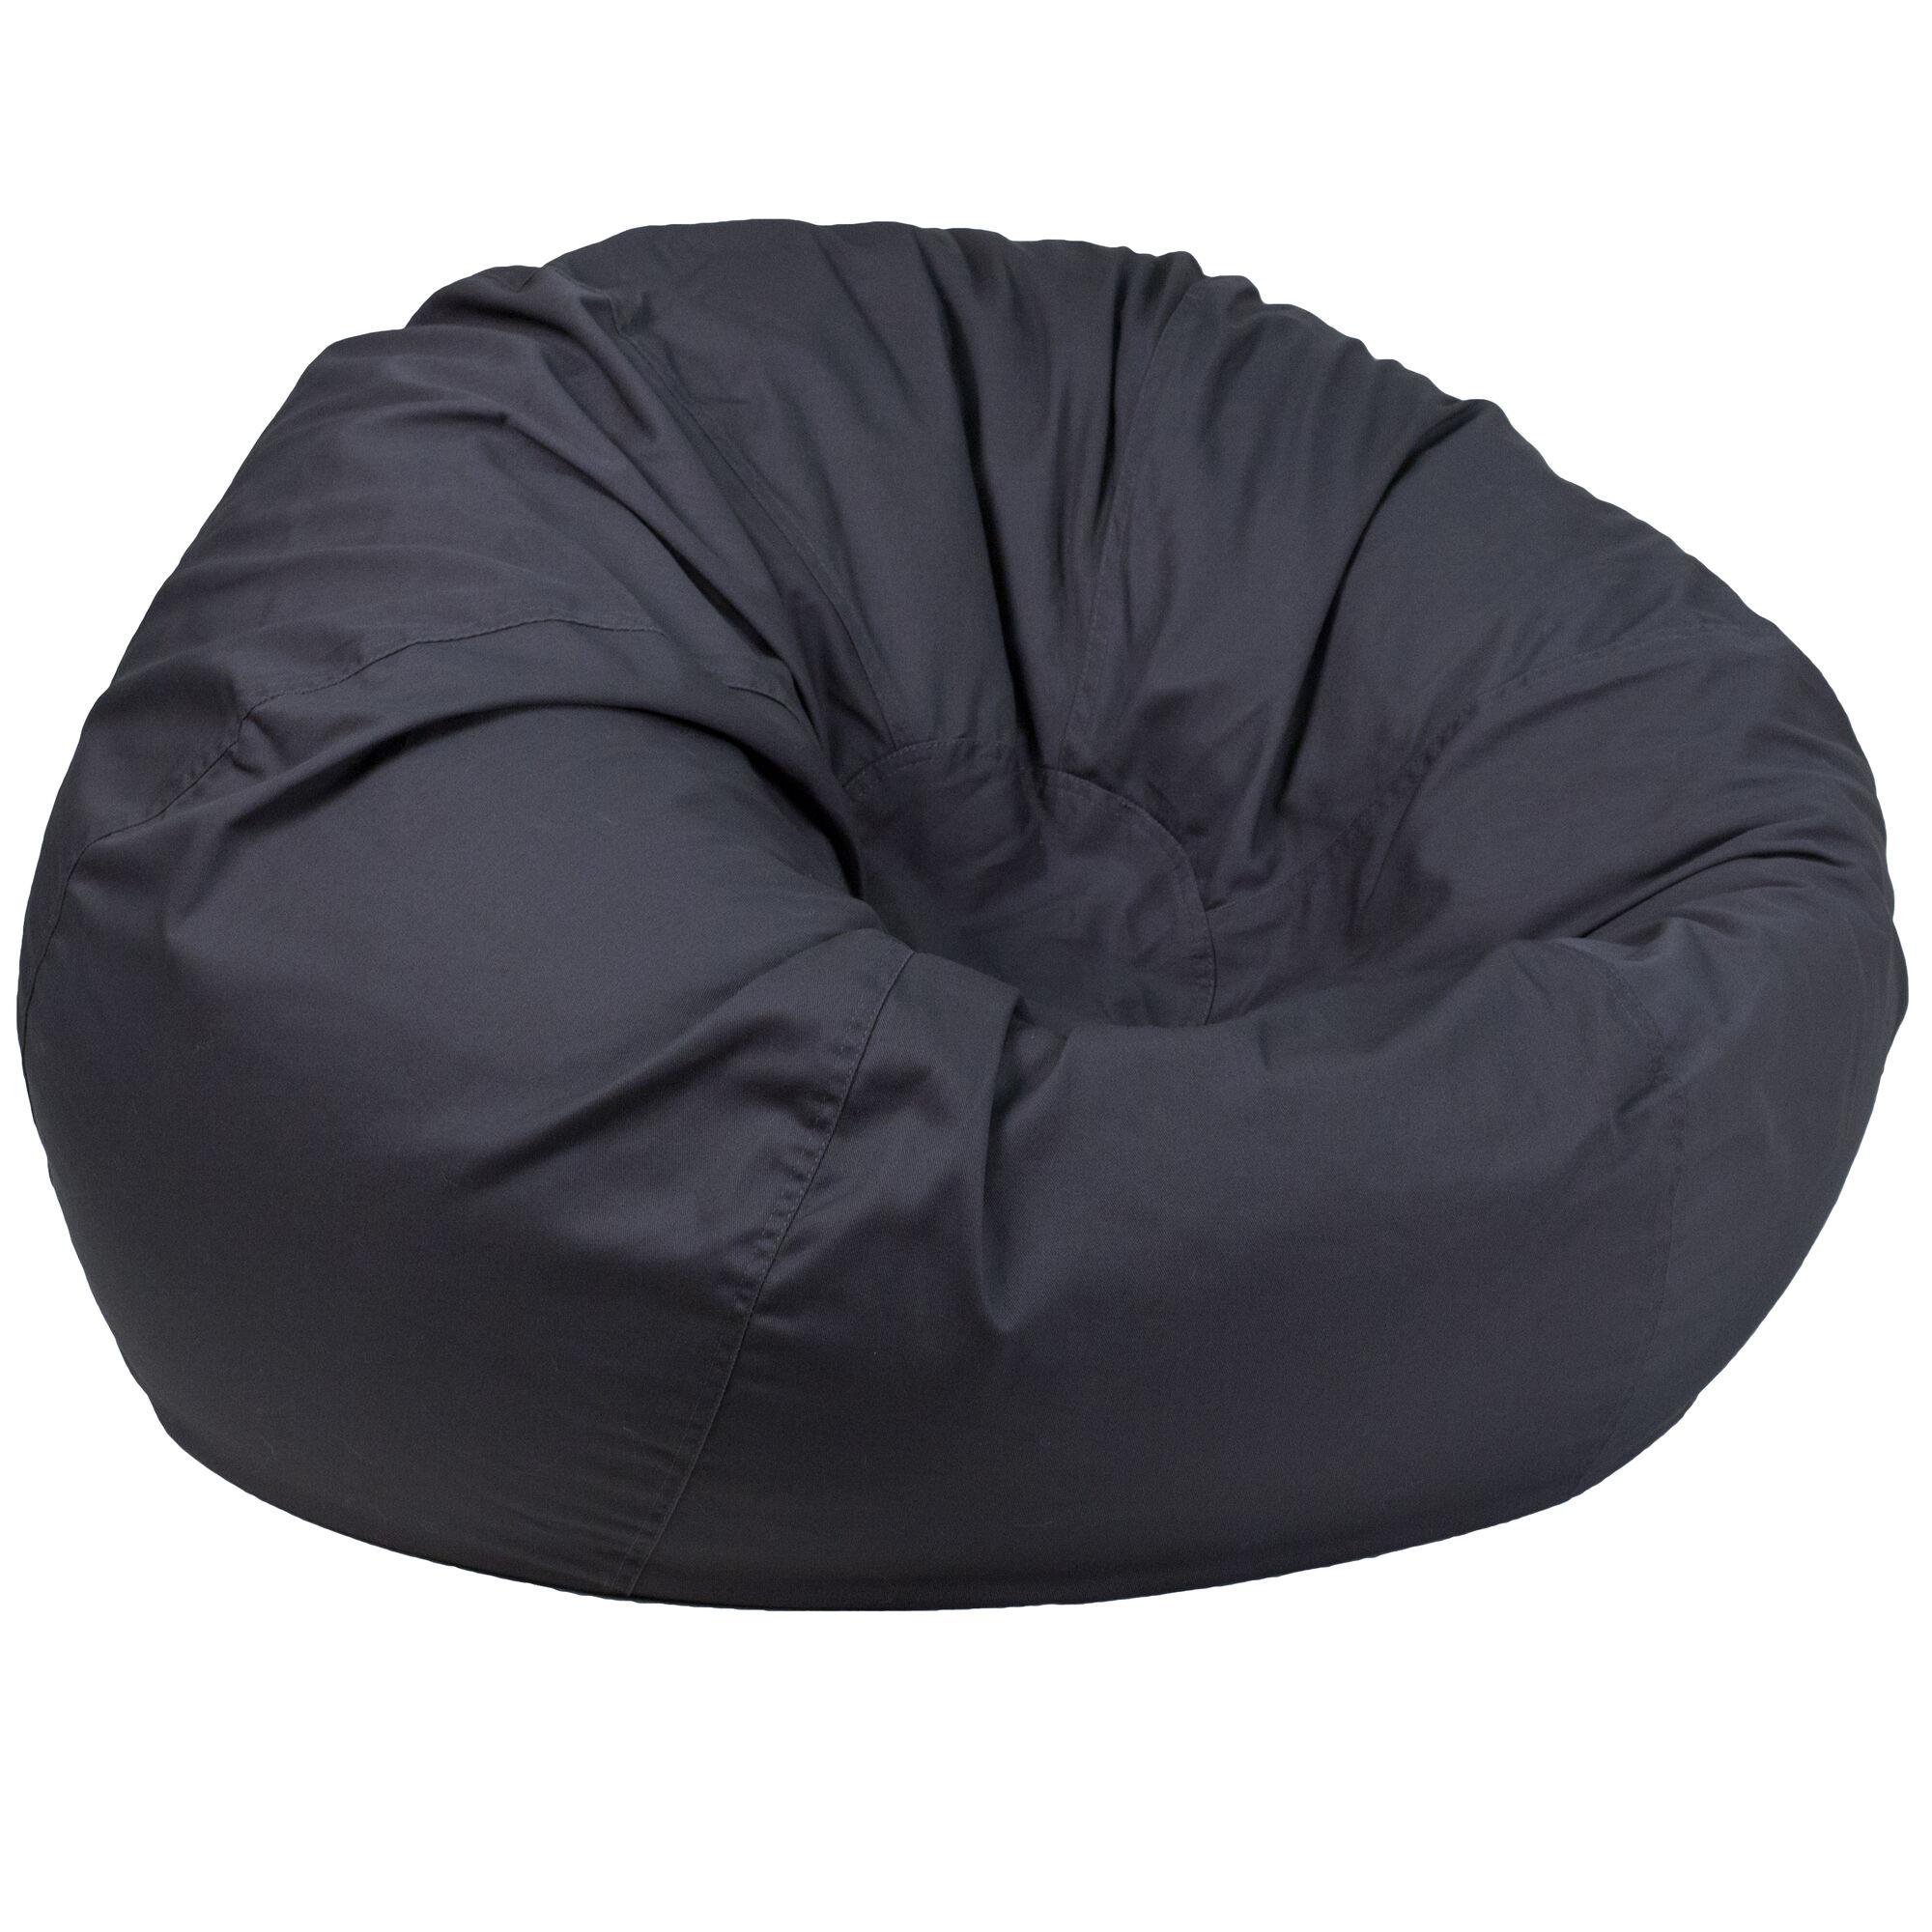 Gray Bean Bag Chair Dg Bean Large Solid Gy Gg